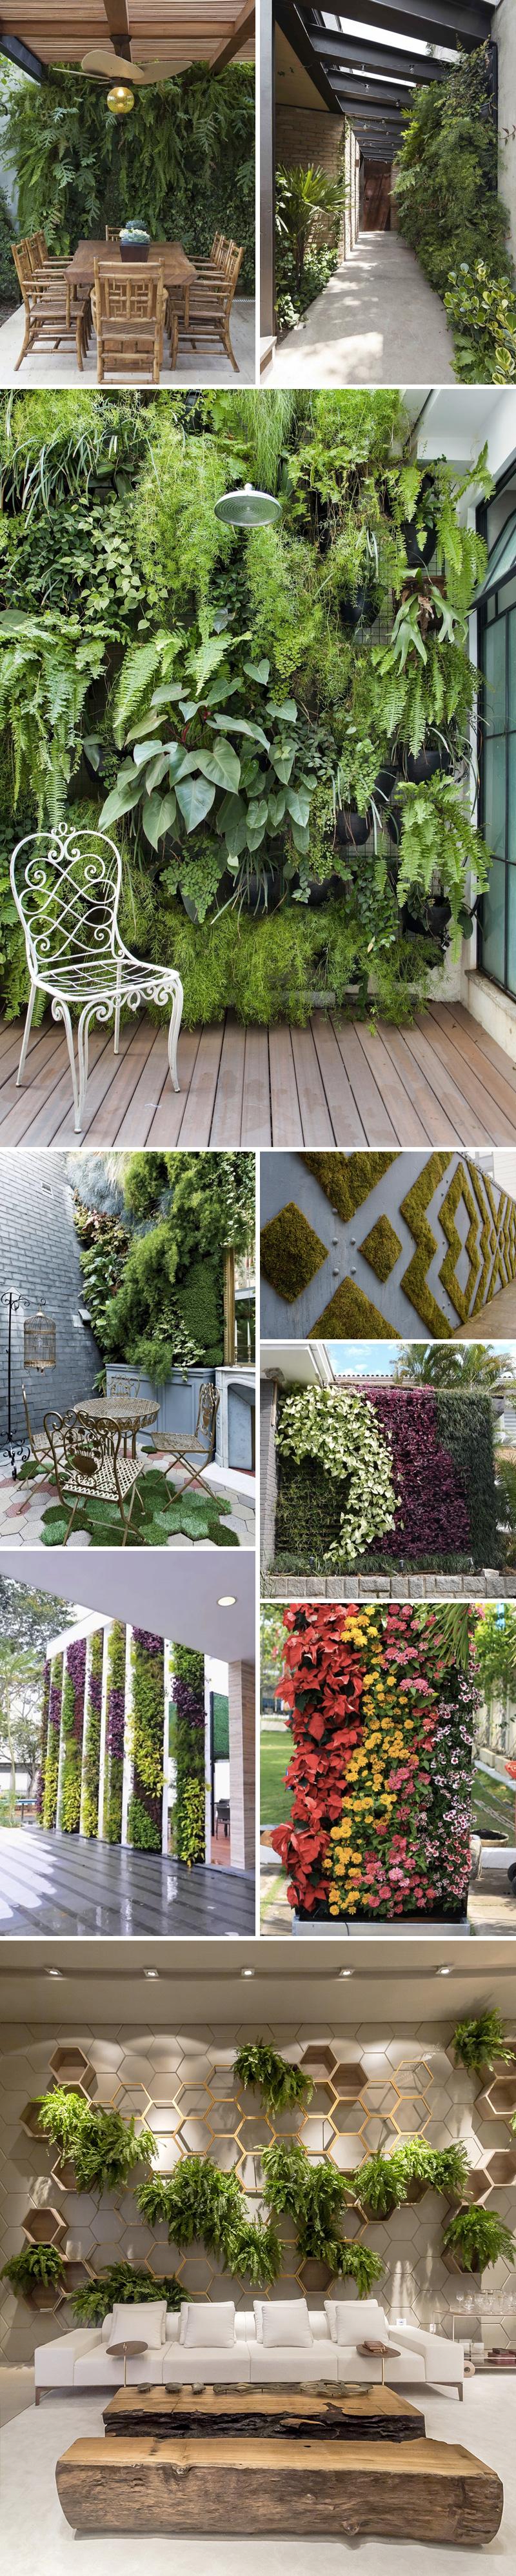 jardins verticais para se inspirar